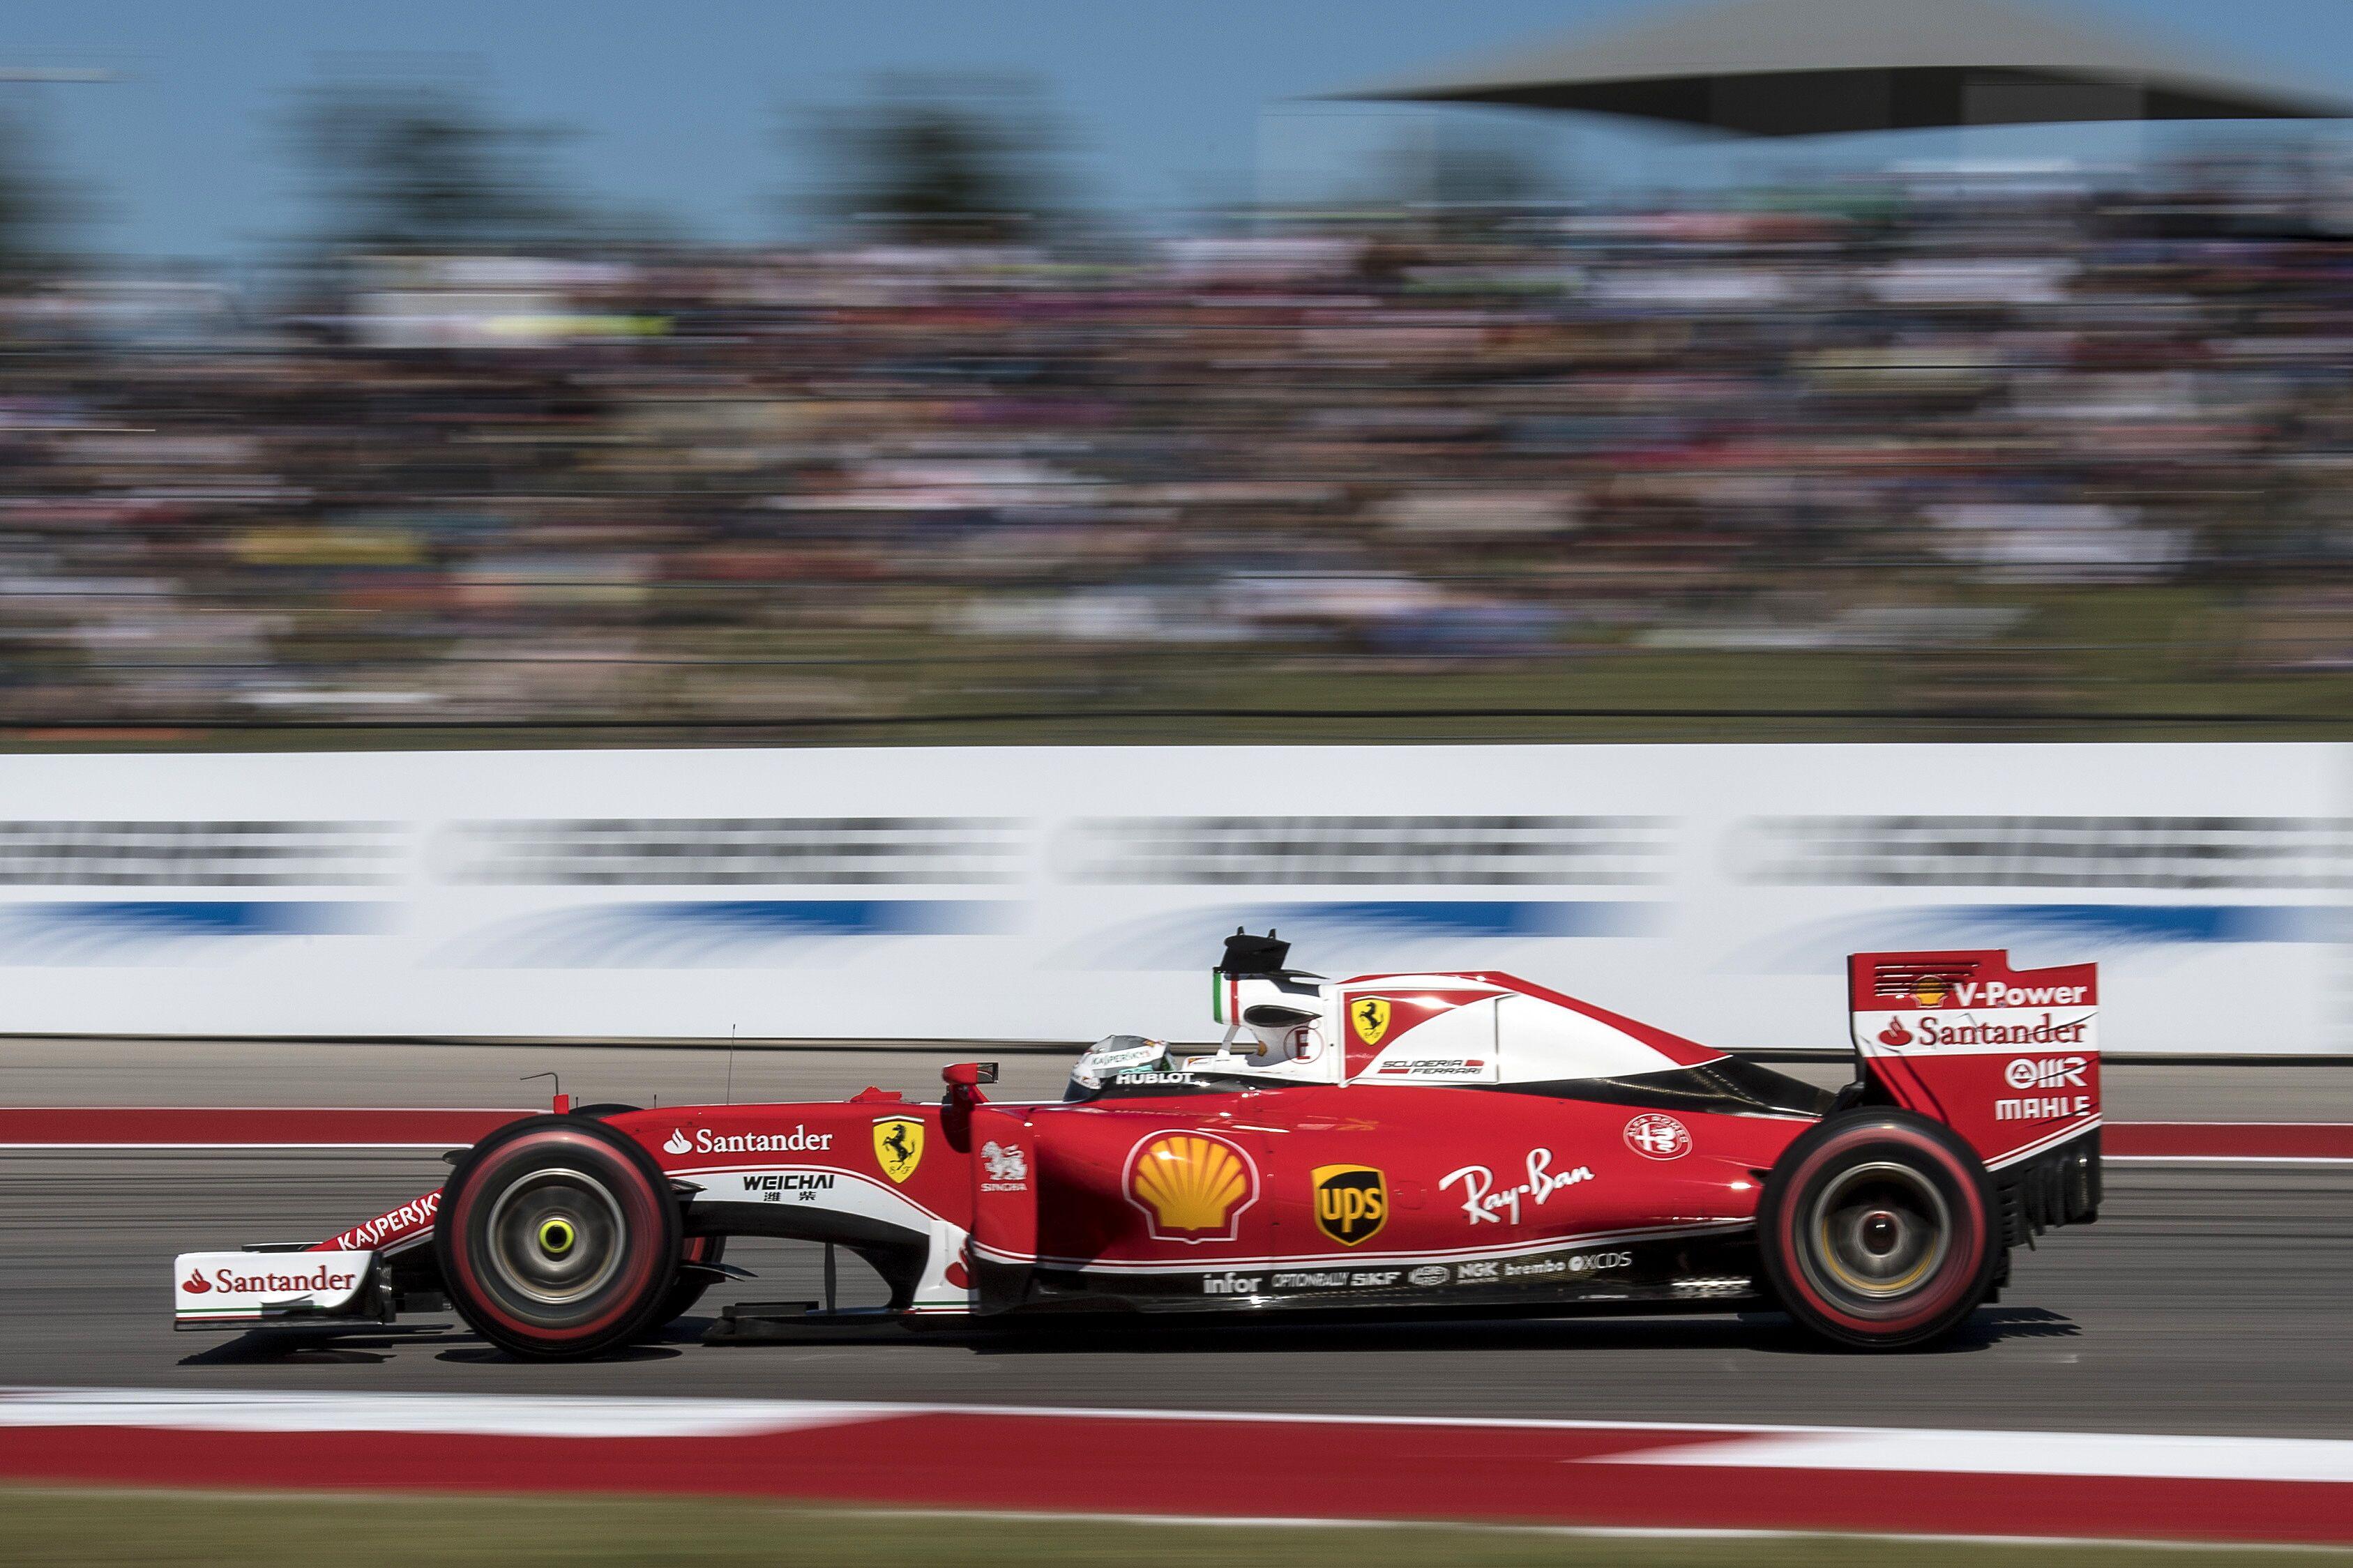 2017 Bahrain Grand Prix Results - Vettel Conquers Mercedes